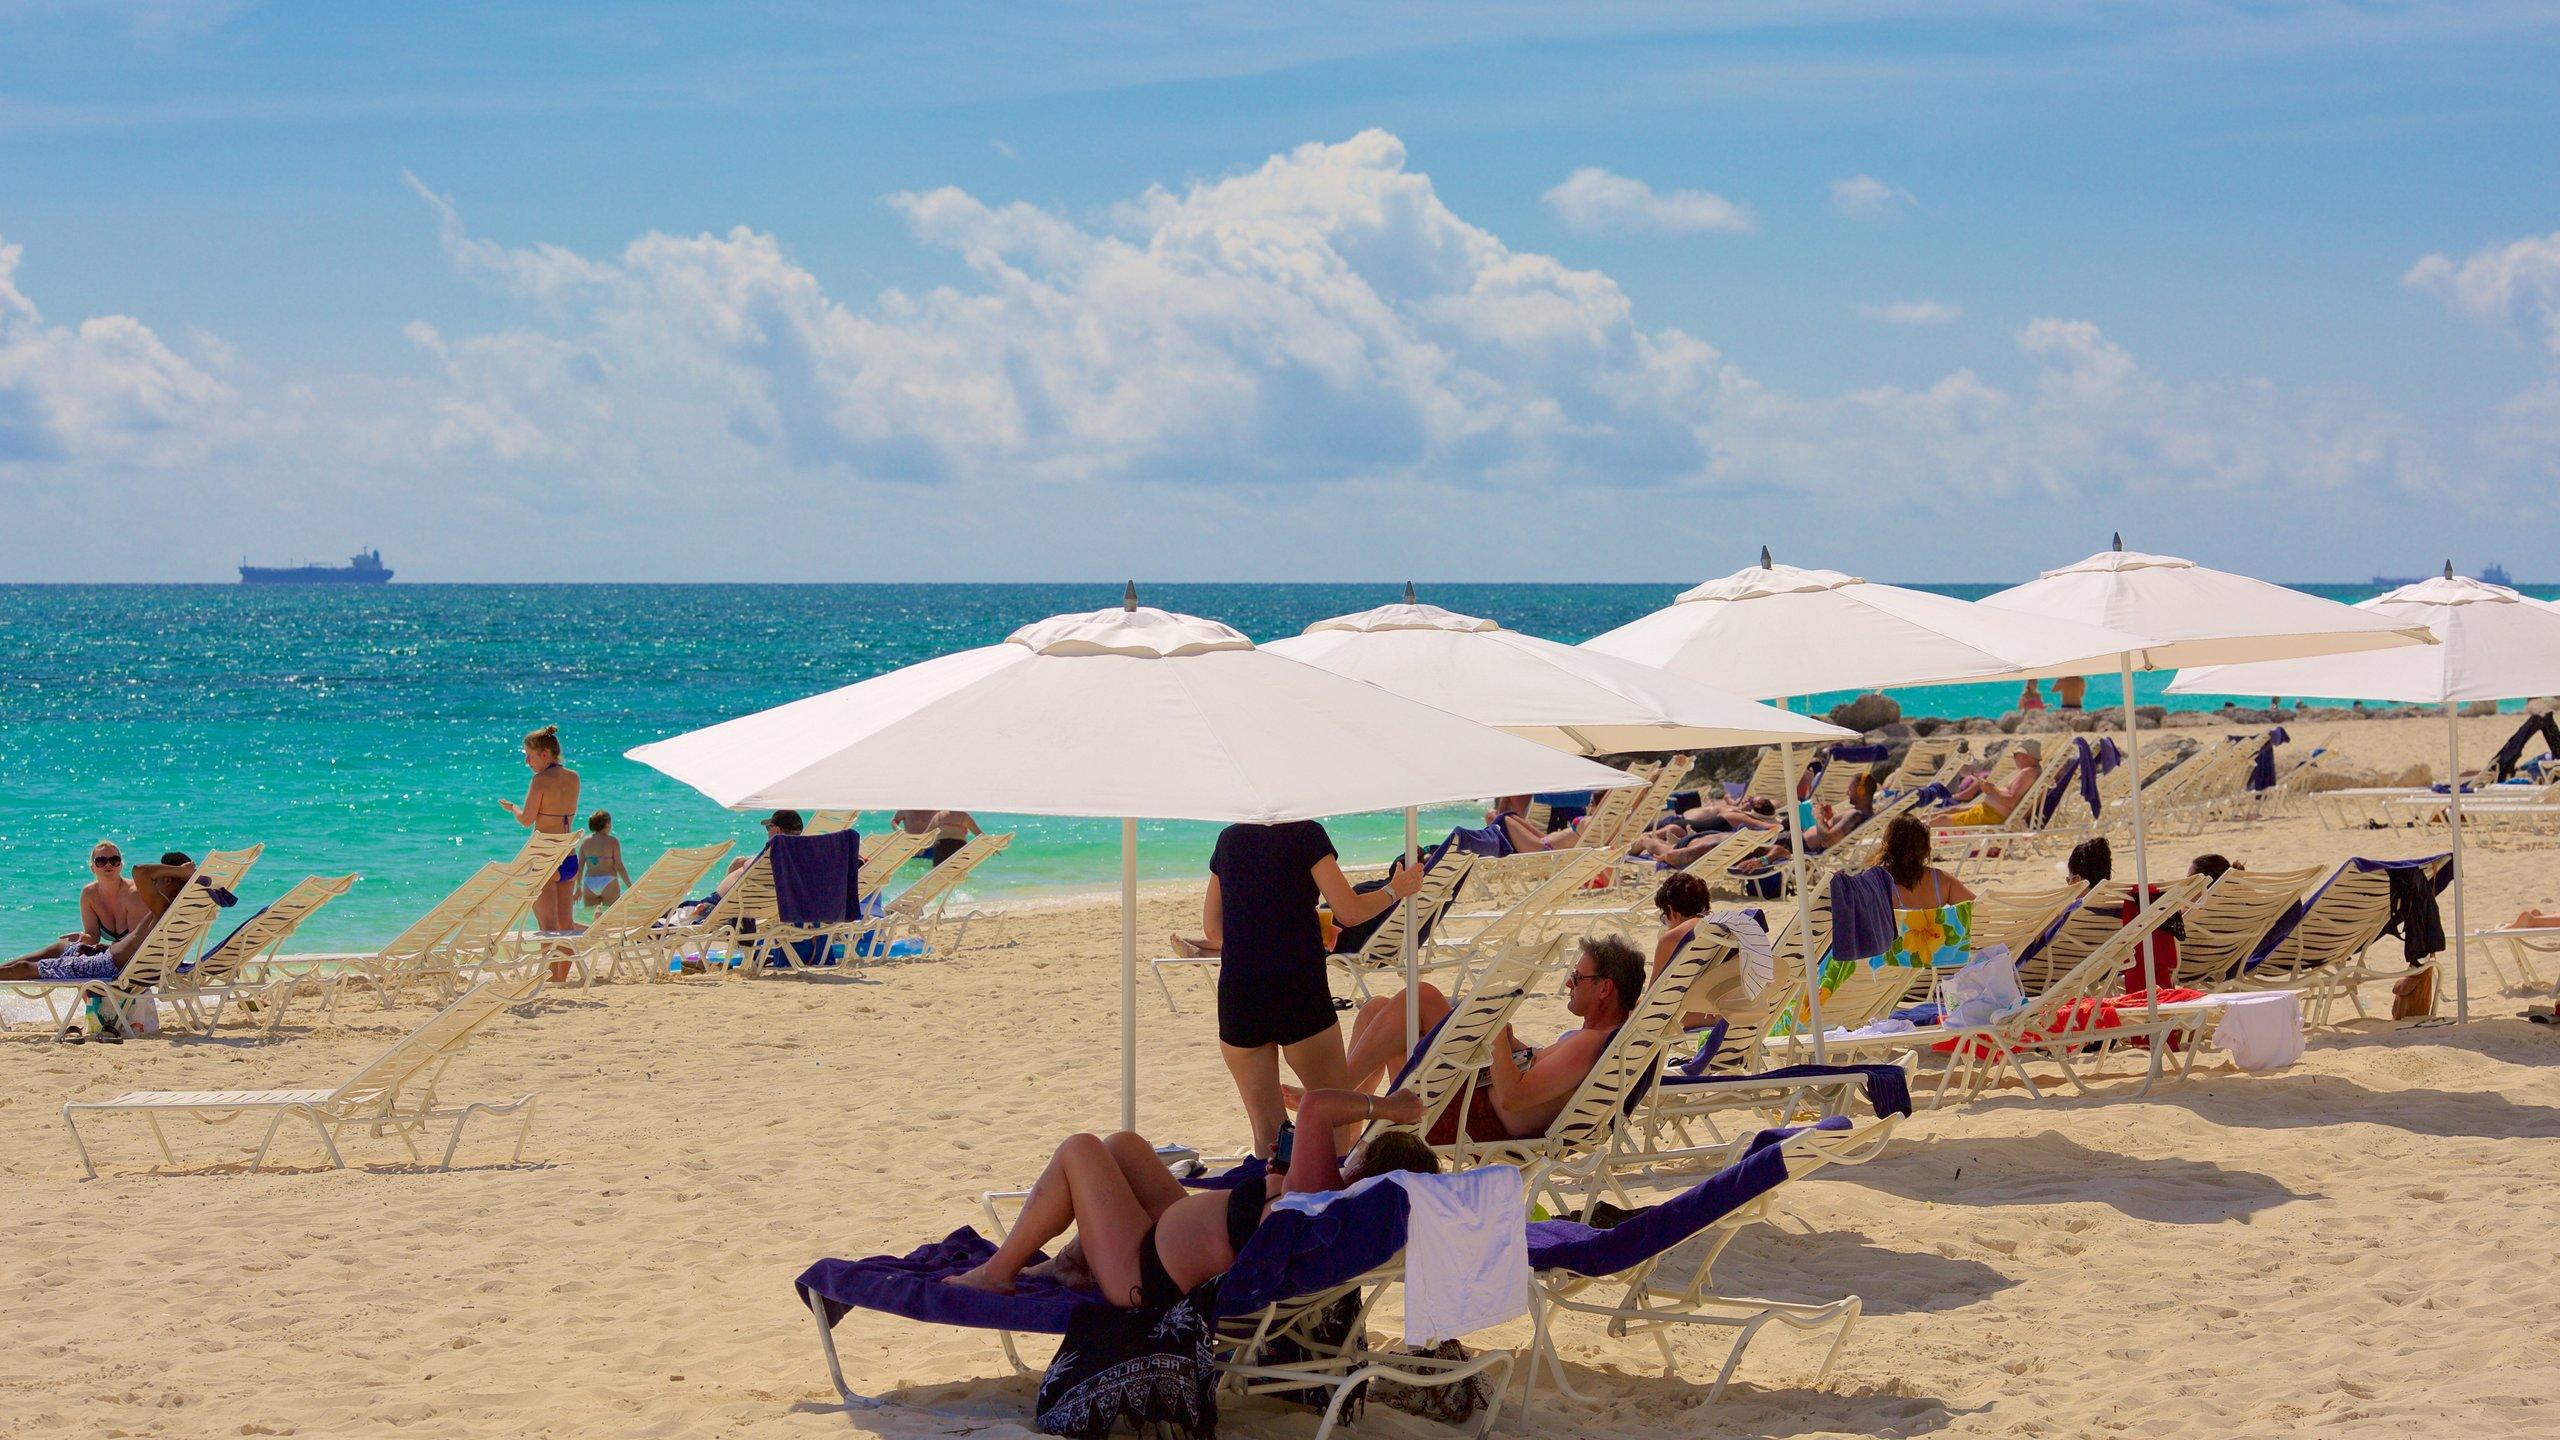 Lucaya Beach, Freeport, Bahamas